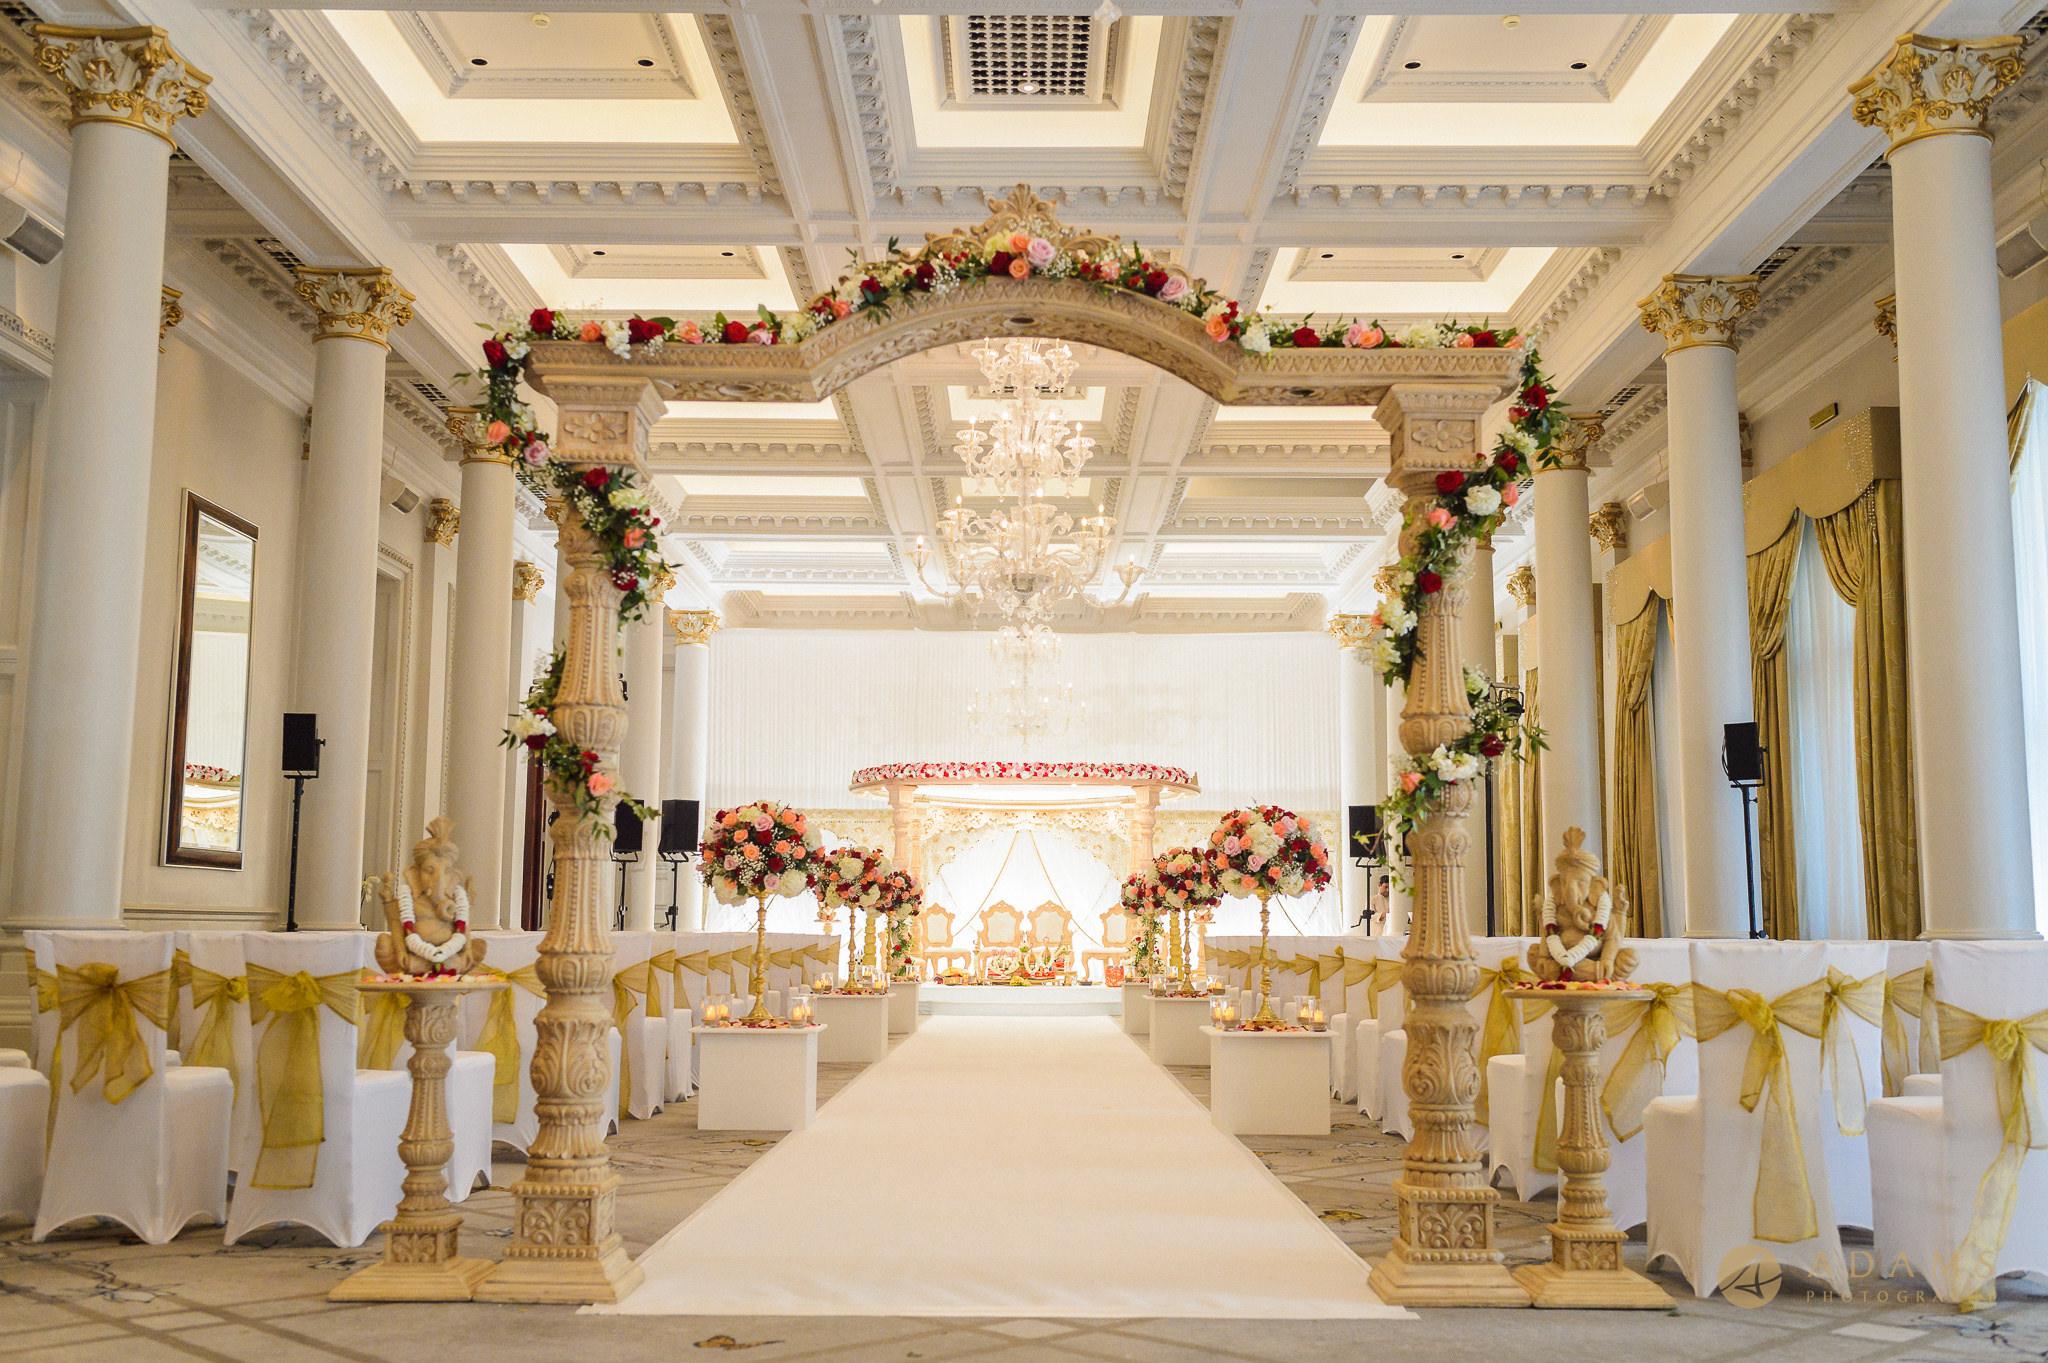 Wedding ceremony room he Langham hotel London